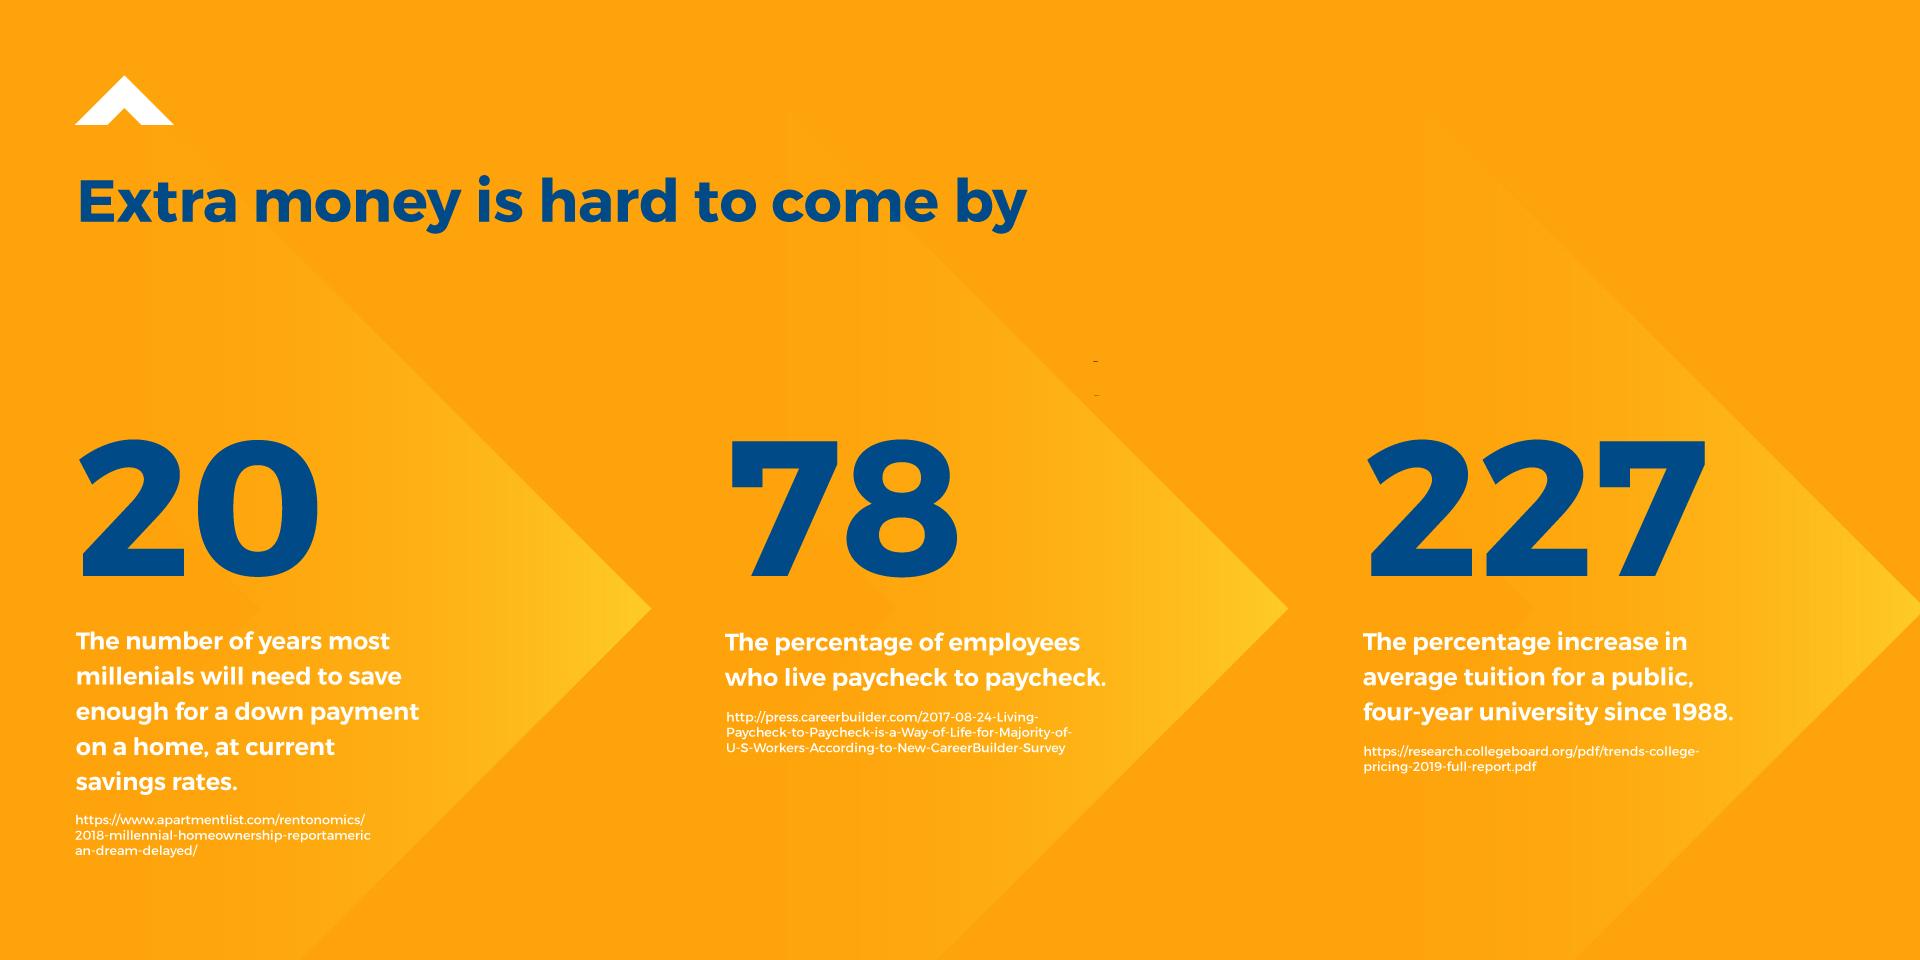 2019_stress-and-finances-infographic_part1_v1.2 (1).jpg